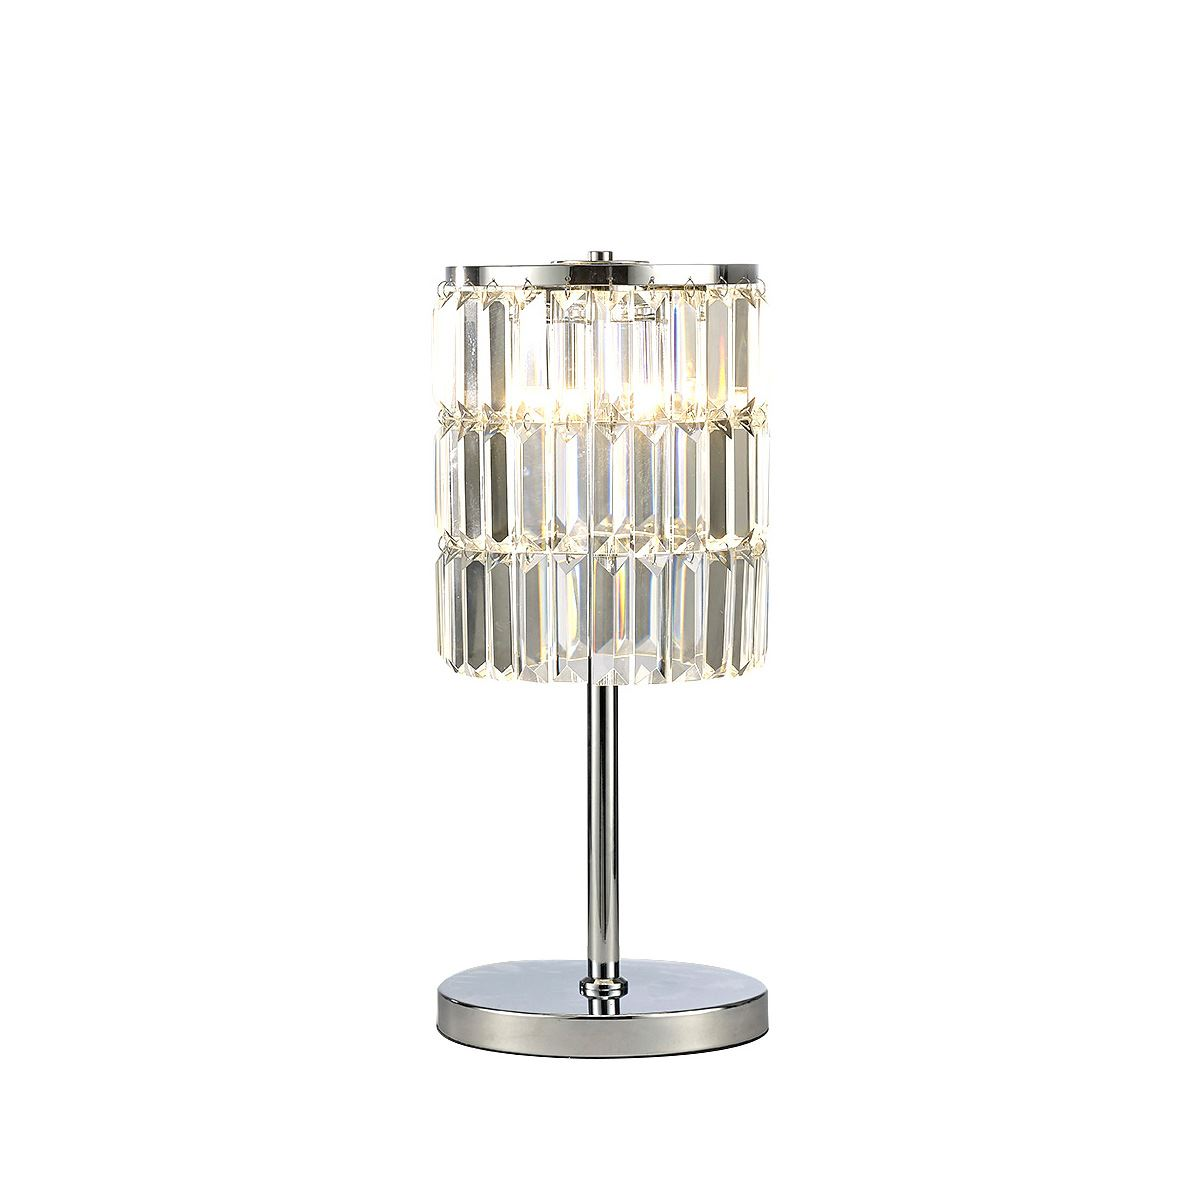 Diyas IL30178 Torre Crystal Curtain Table Lamp 3 Light Polished Chrome